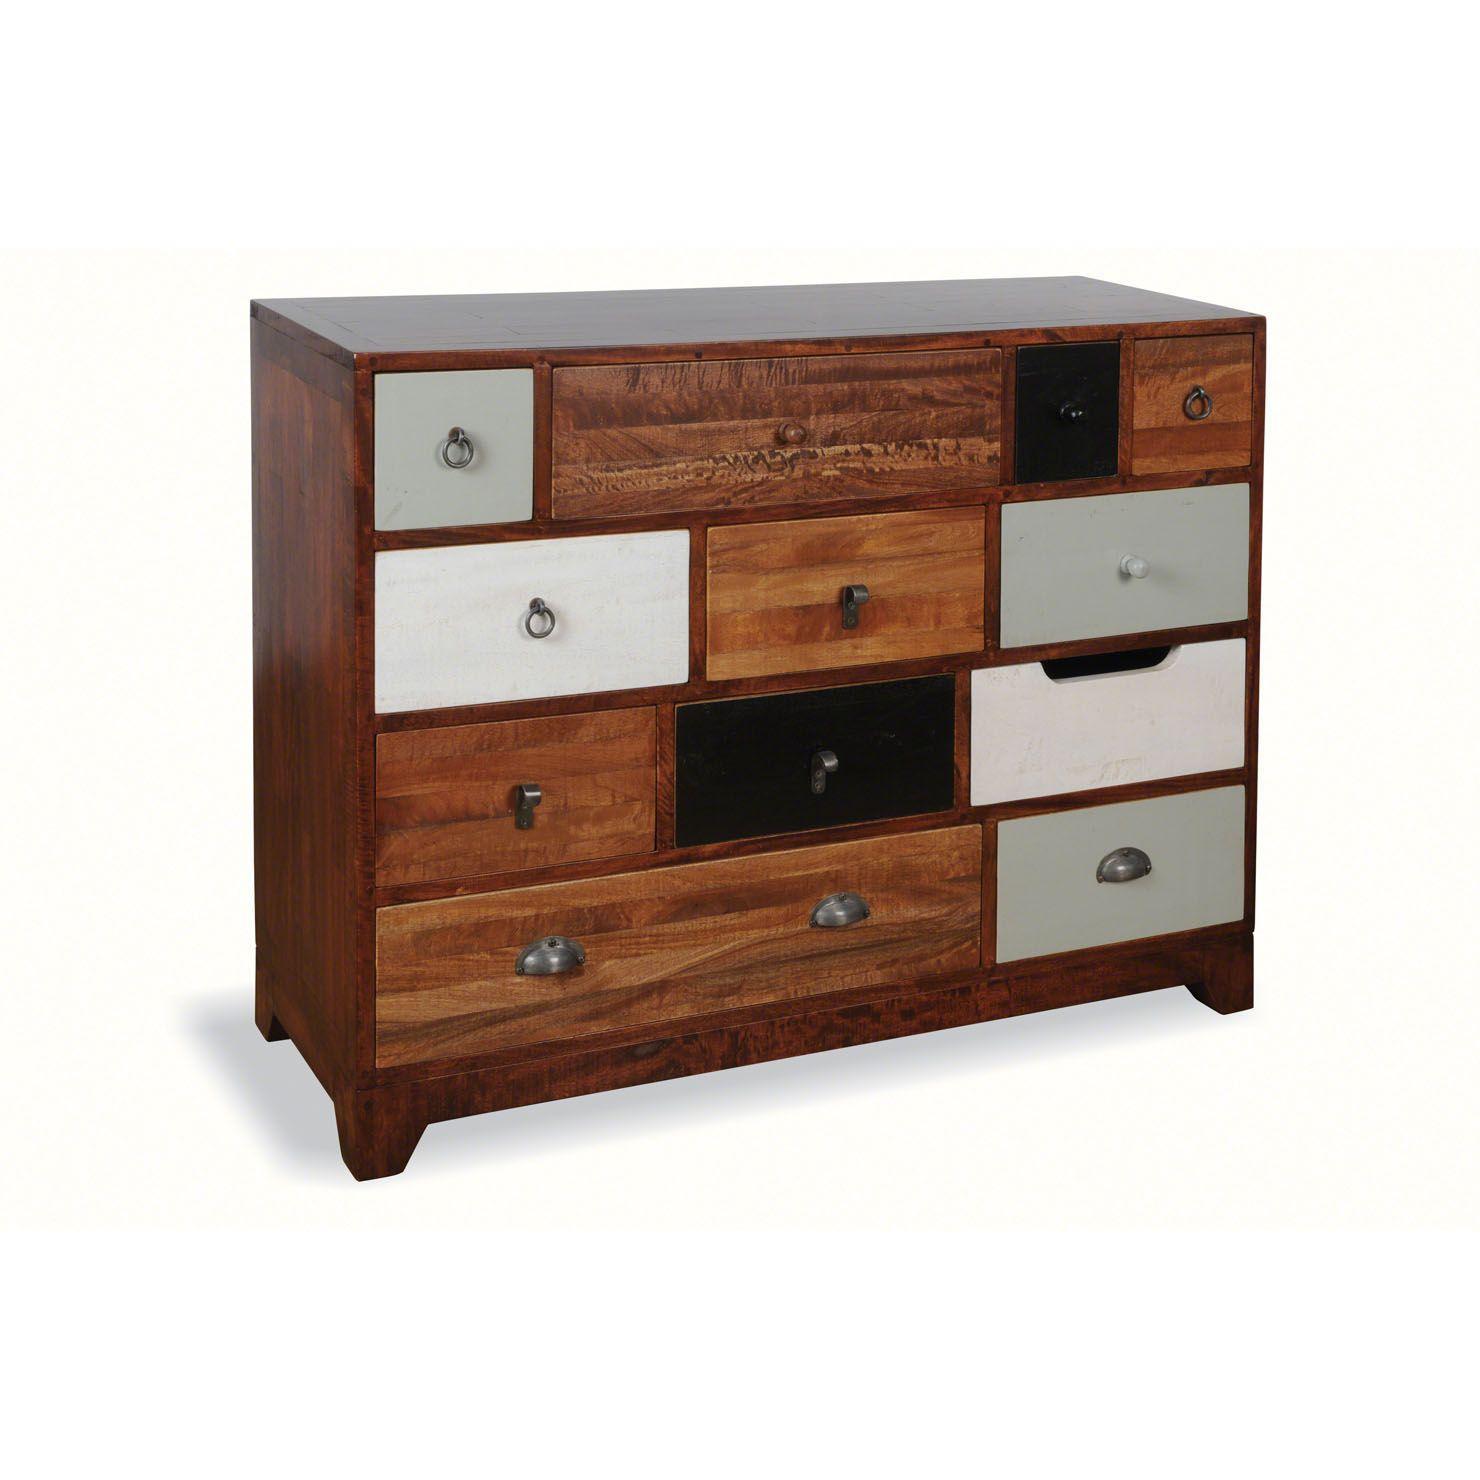 Bluebone british vintage drawer chest drawers vintage drawers